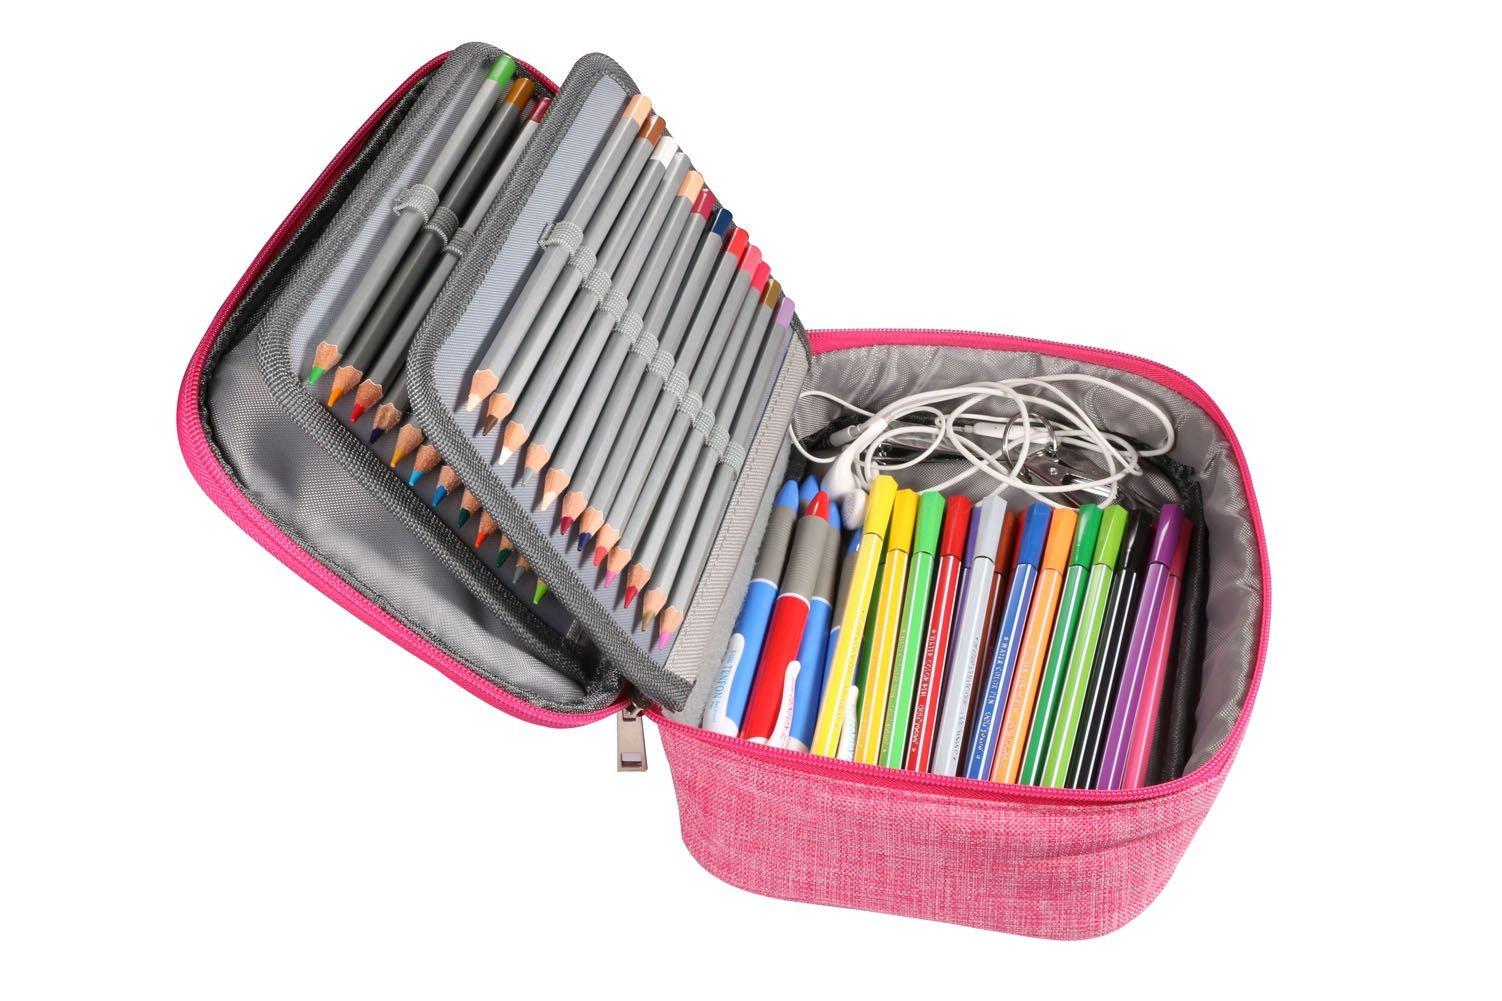 AMGOMH Estuches, 72 ranuras portalápices Caja de lápiz de Estudiantes Organizador Estuche Escolar de caso lapices de colores lápiz bolsa de arte dibujo Estuches Escolares Pencil Case (Rosa): Amazon.es: Oficina y papelería